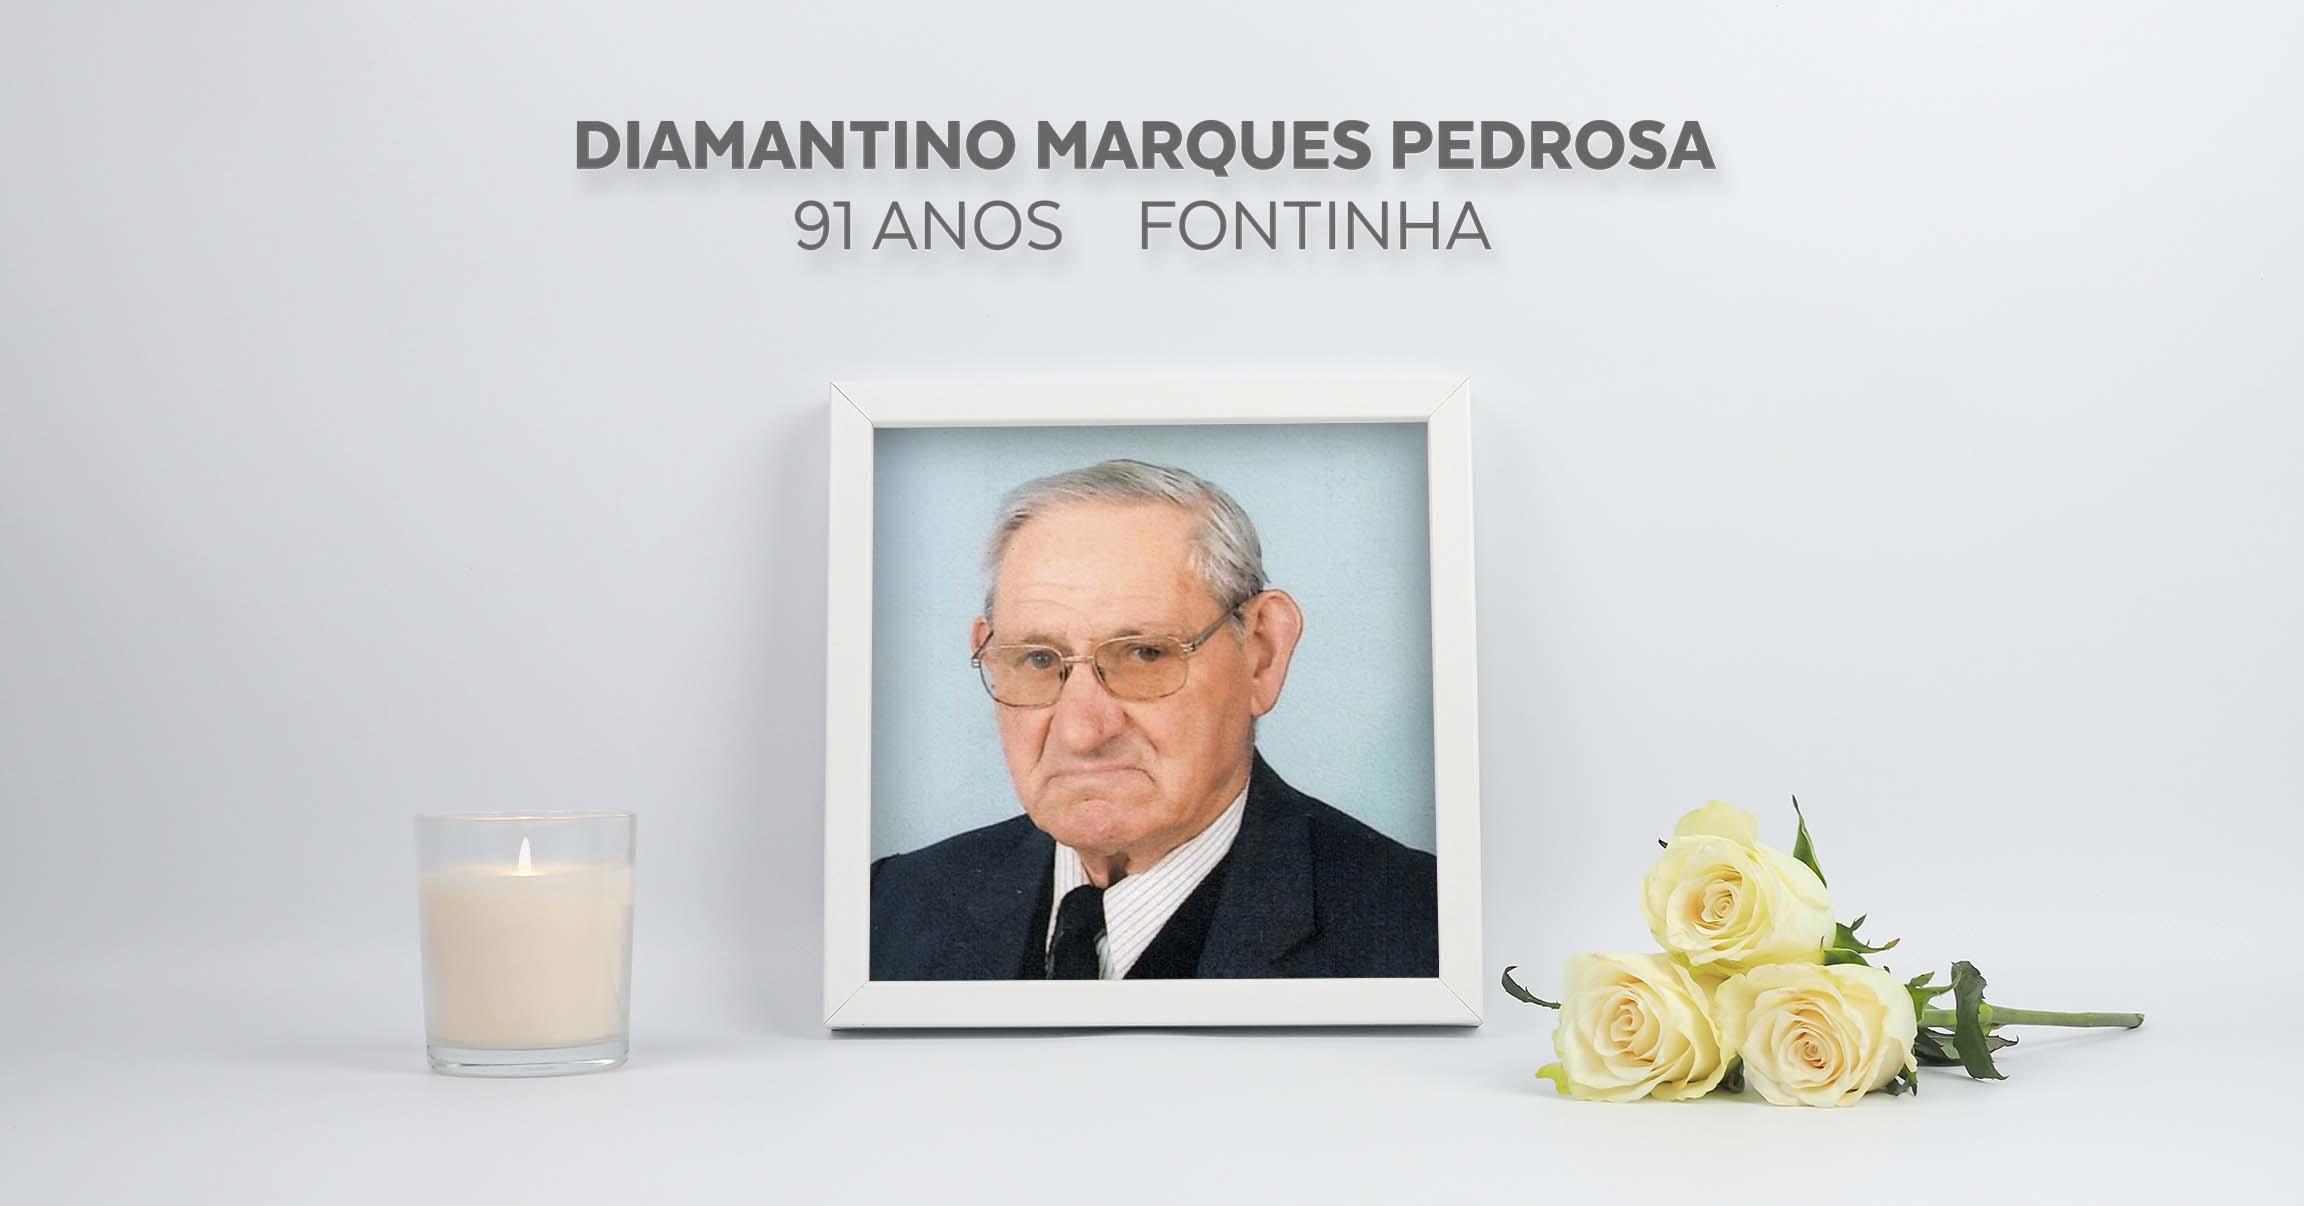 Diamantino Marques Pedrosa